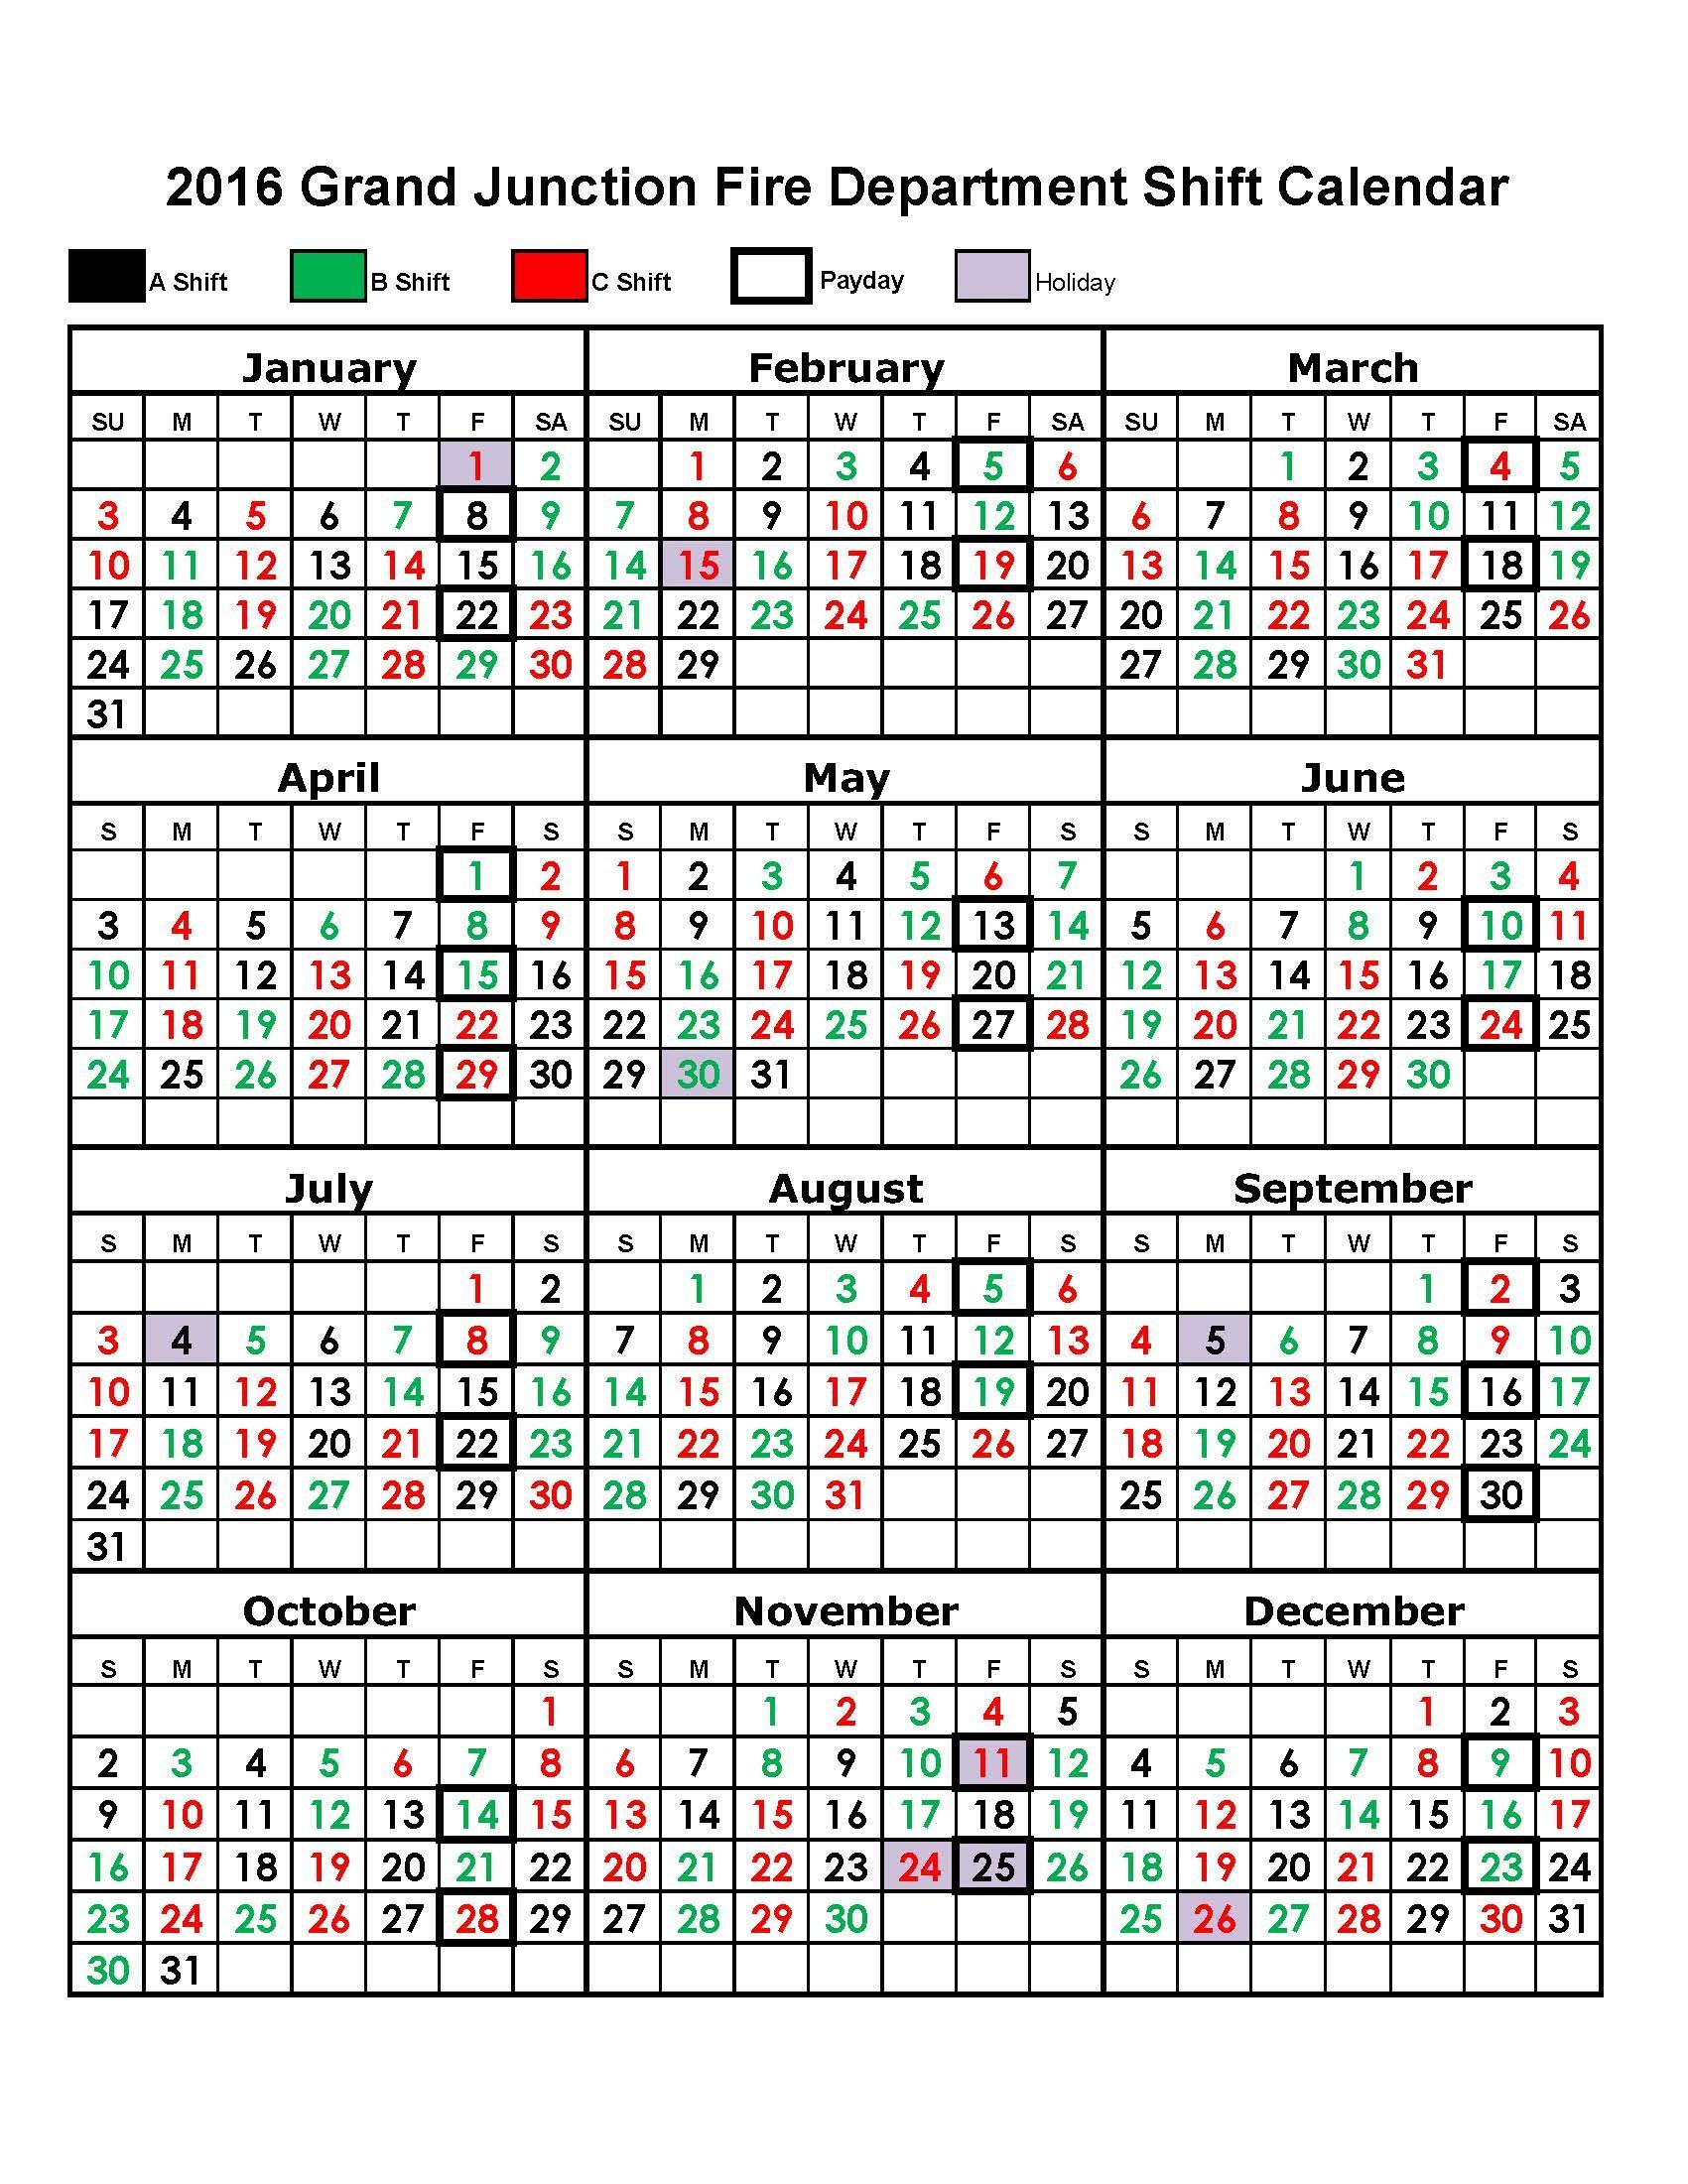 Firefighter Shift Calendar Template | Example Calendar Printable